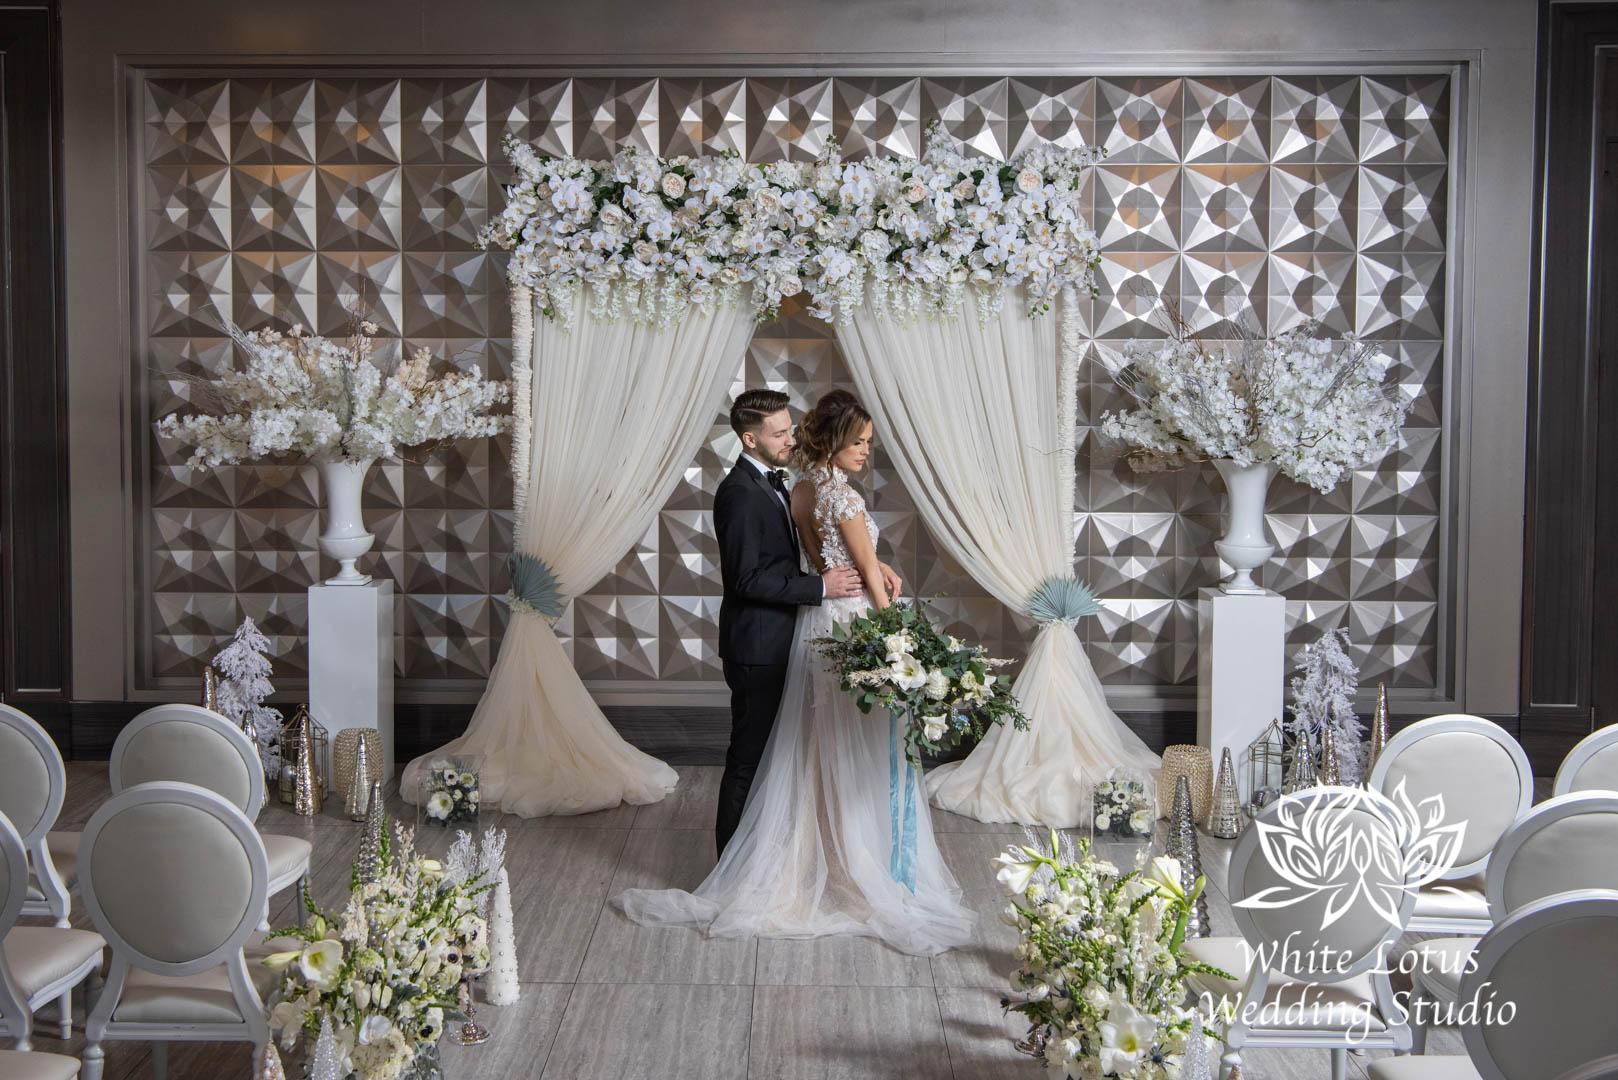 042- GLAM WINTERLUXE WEDDING INSPIRATION